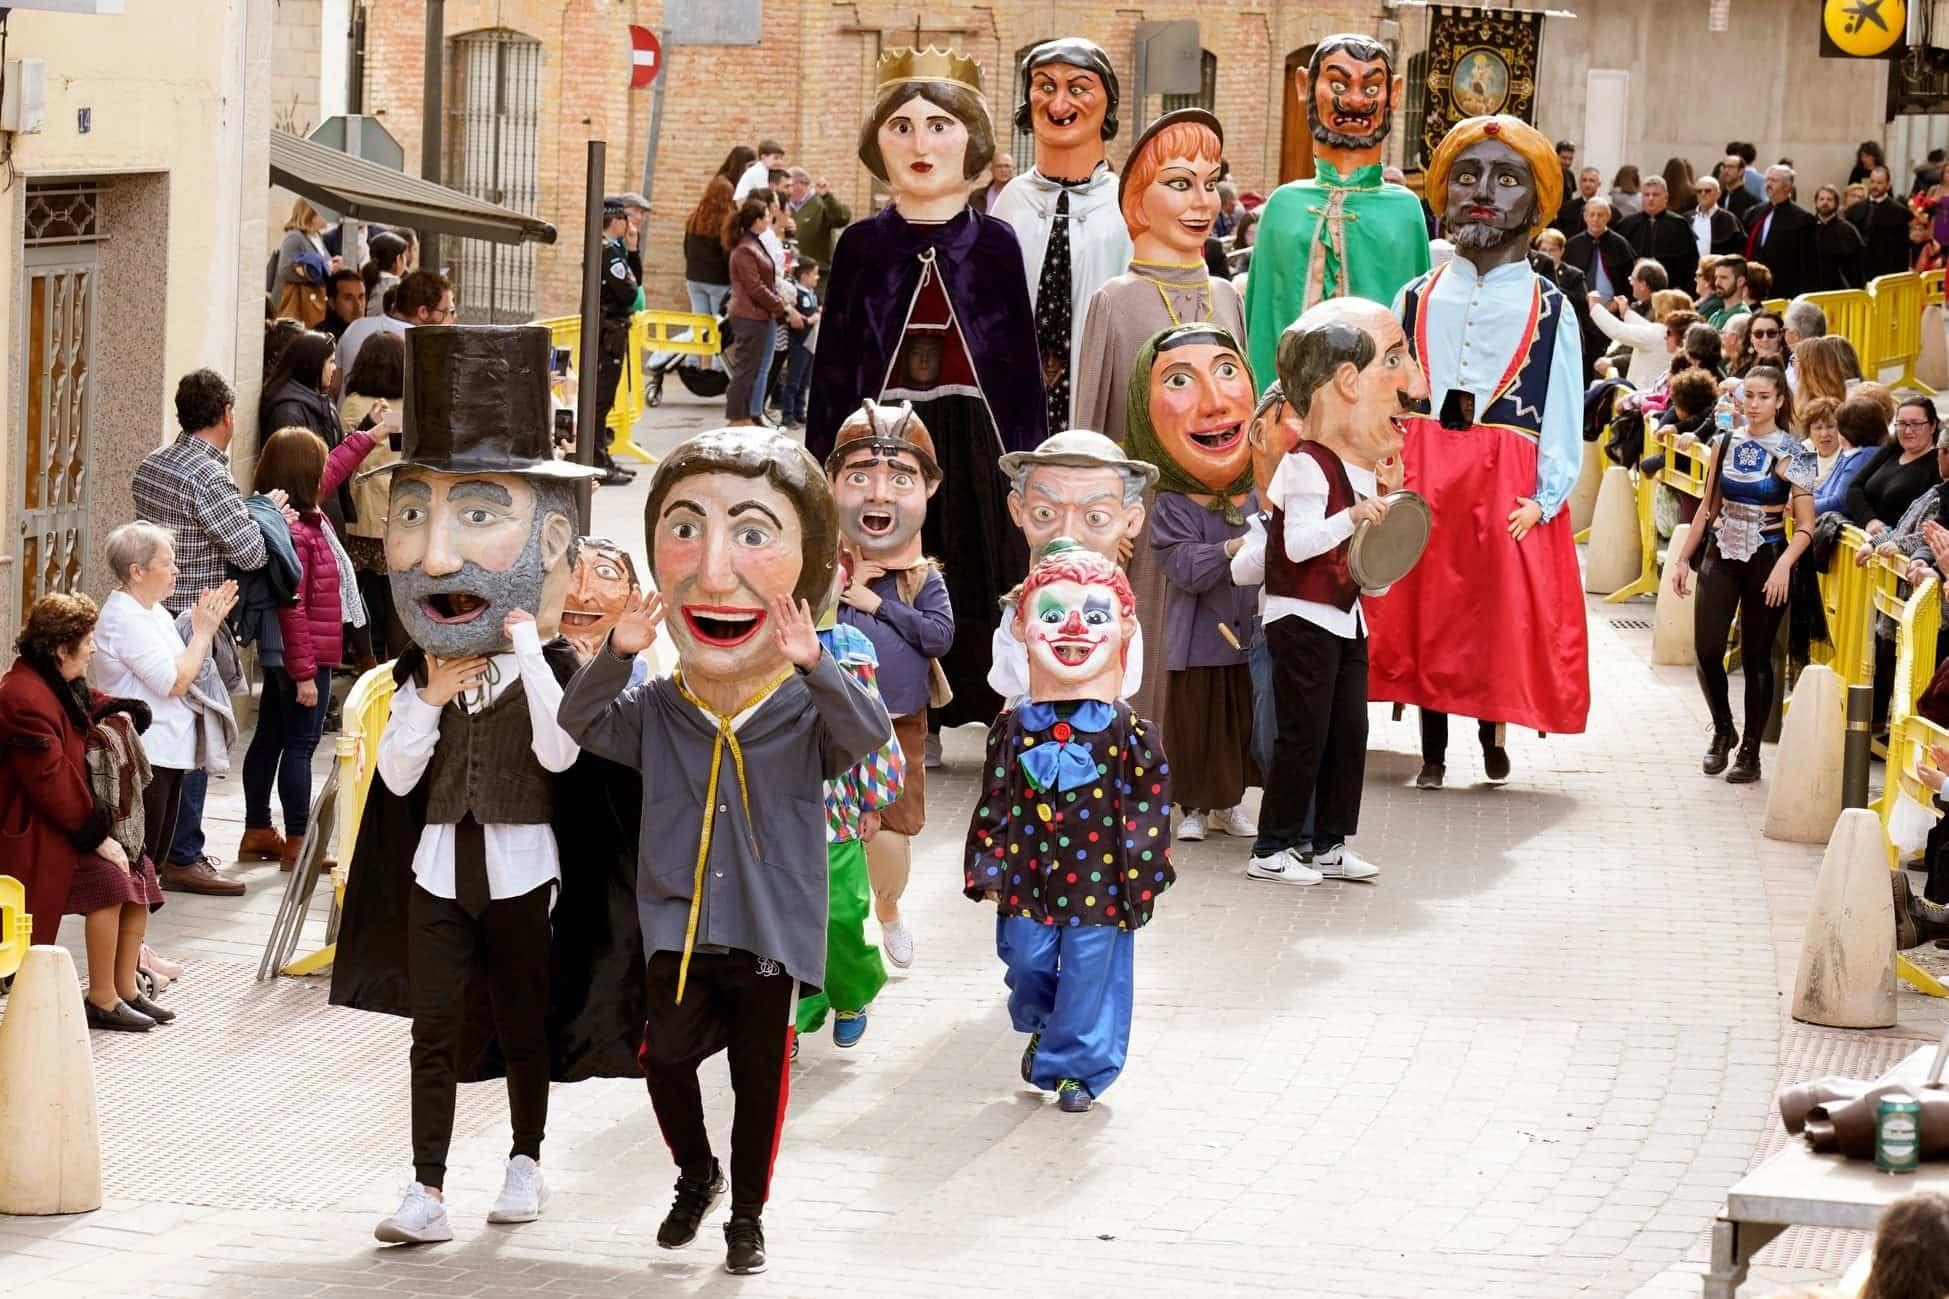 Carnaval de herencia 2020 ofertorio 63 - Selección de fotografías del Ofertorio del Carnaval de Herencia